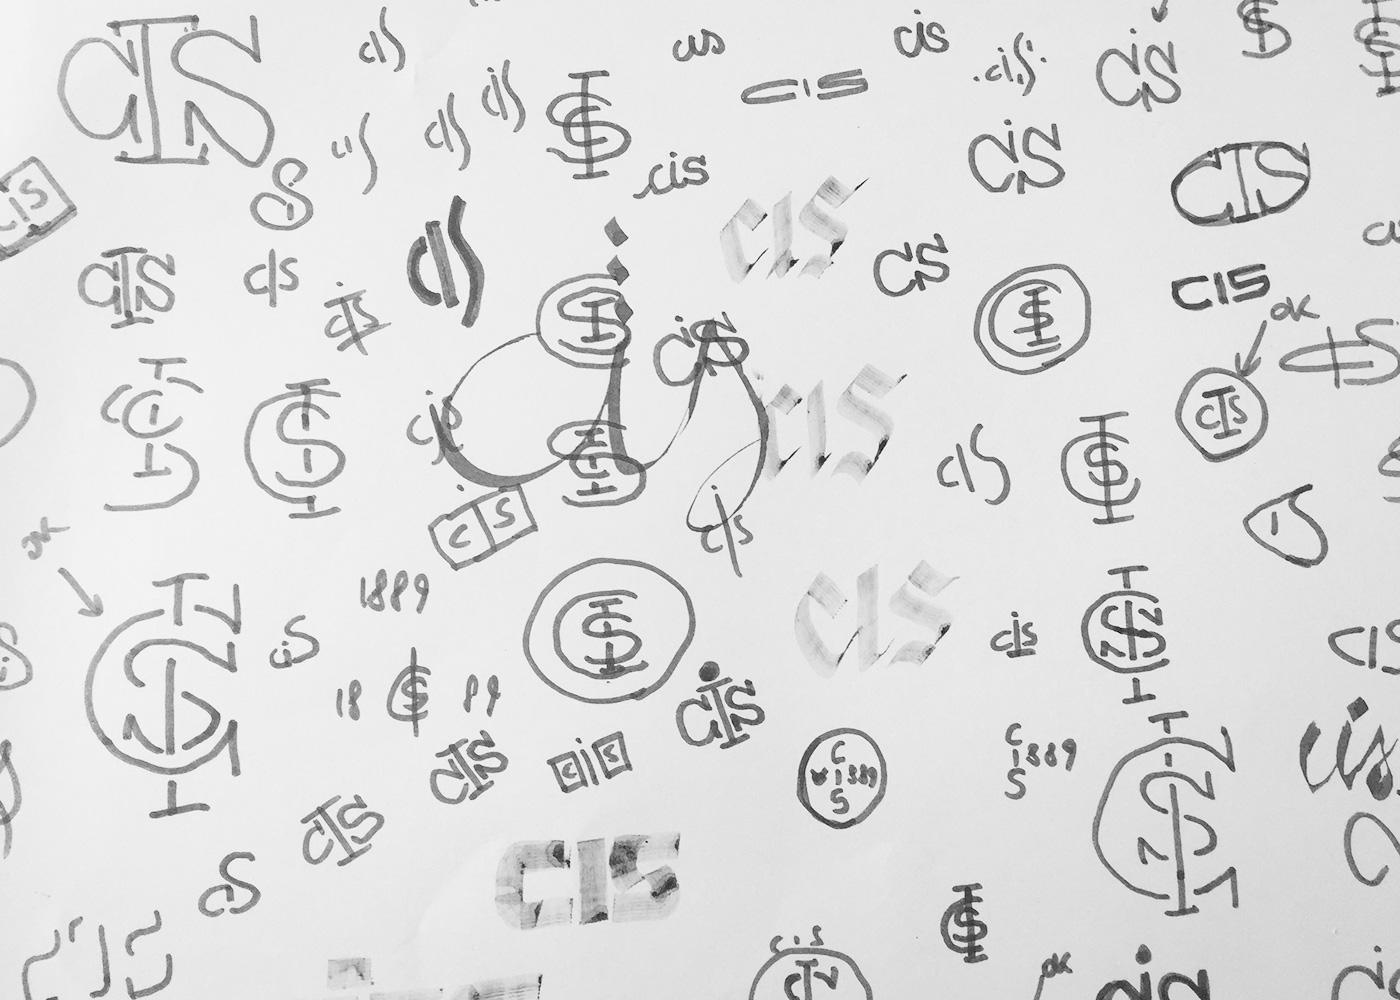 00 Macelleria cis logotipo grafico milano